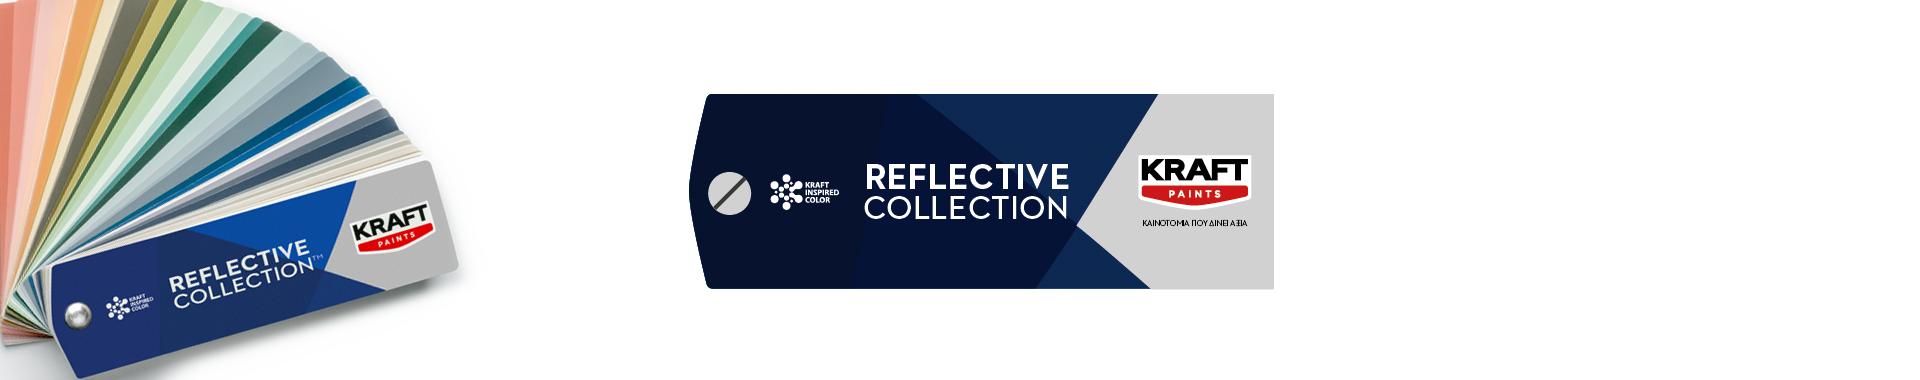 https://kraftpaints.gr/wp-content/uploads/2018/05/ReflectiveCollection.png